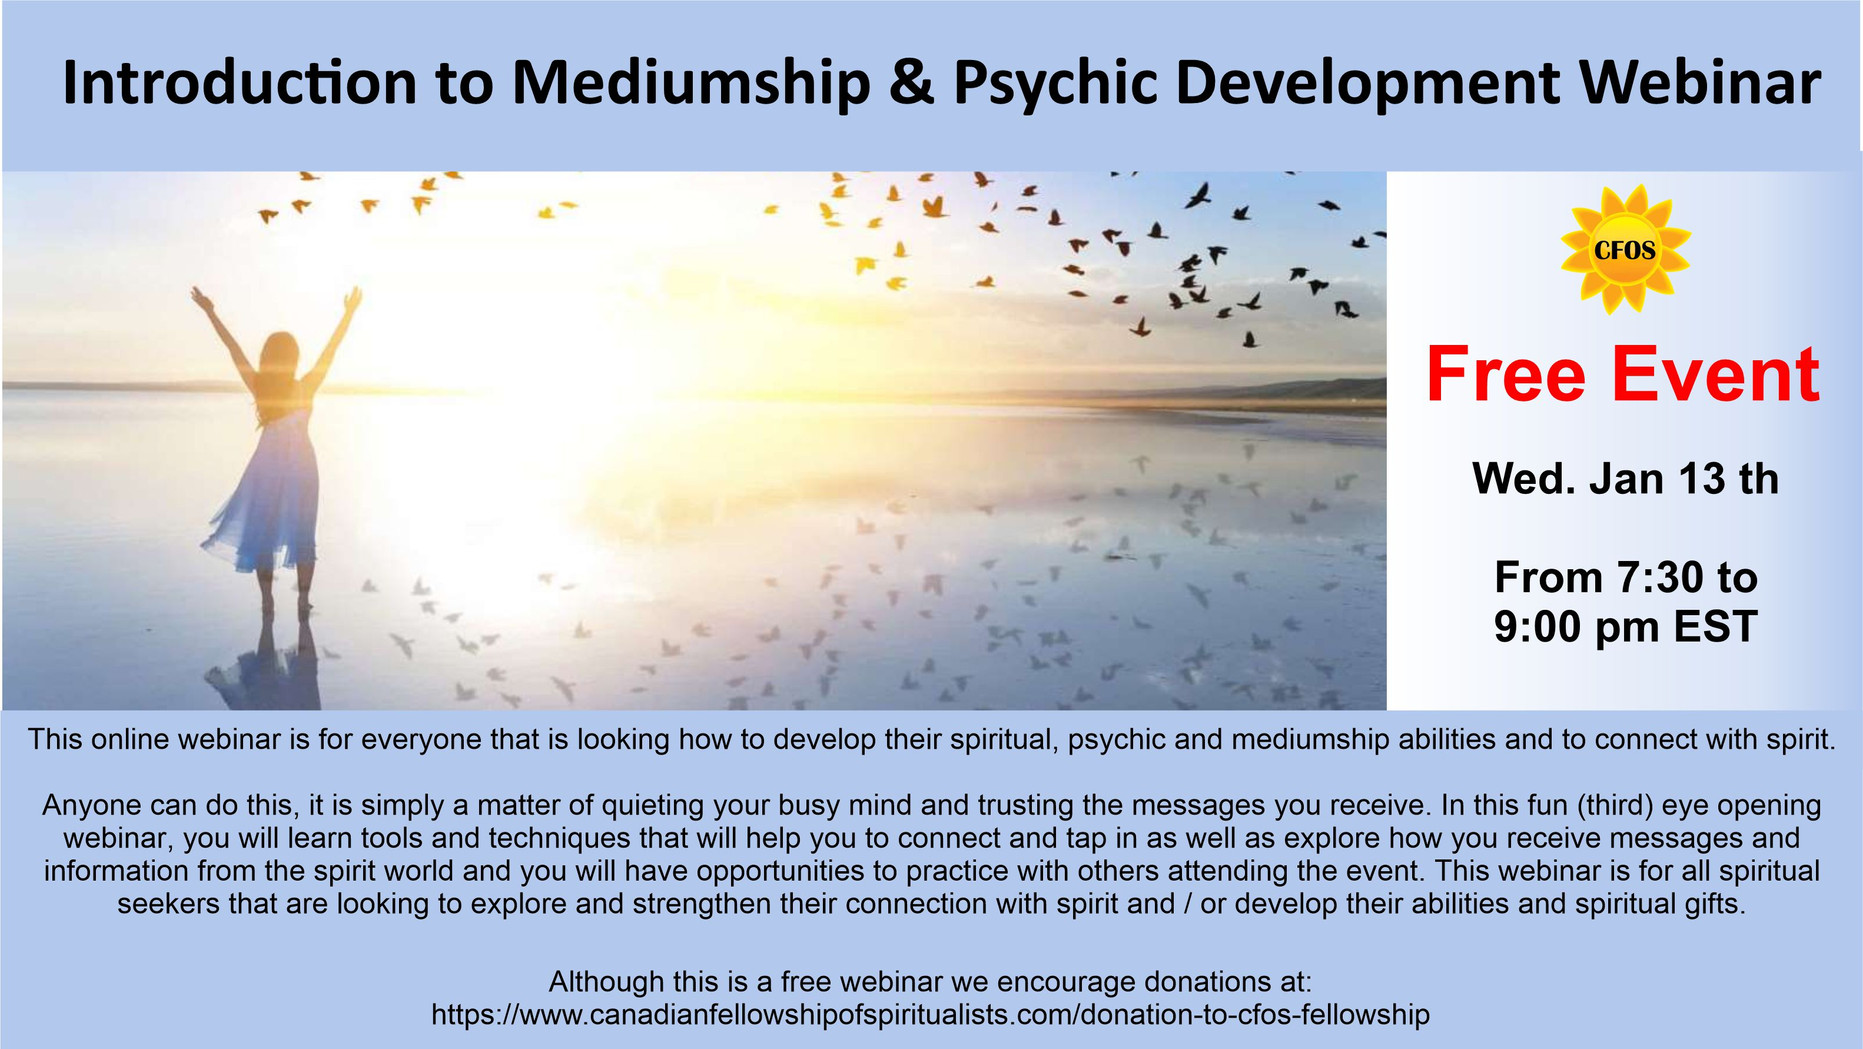 Webinar Intro to Mediumship & Psychic